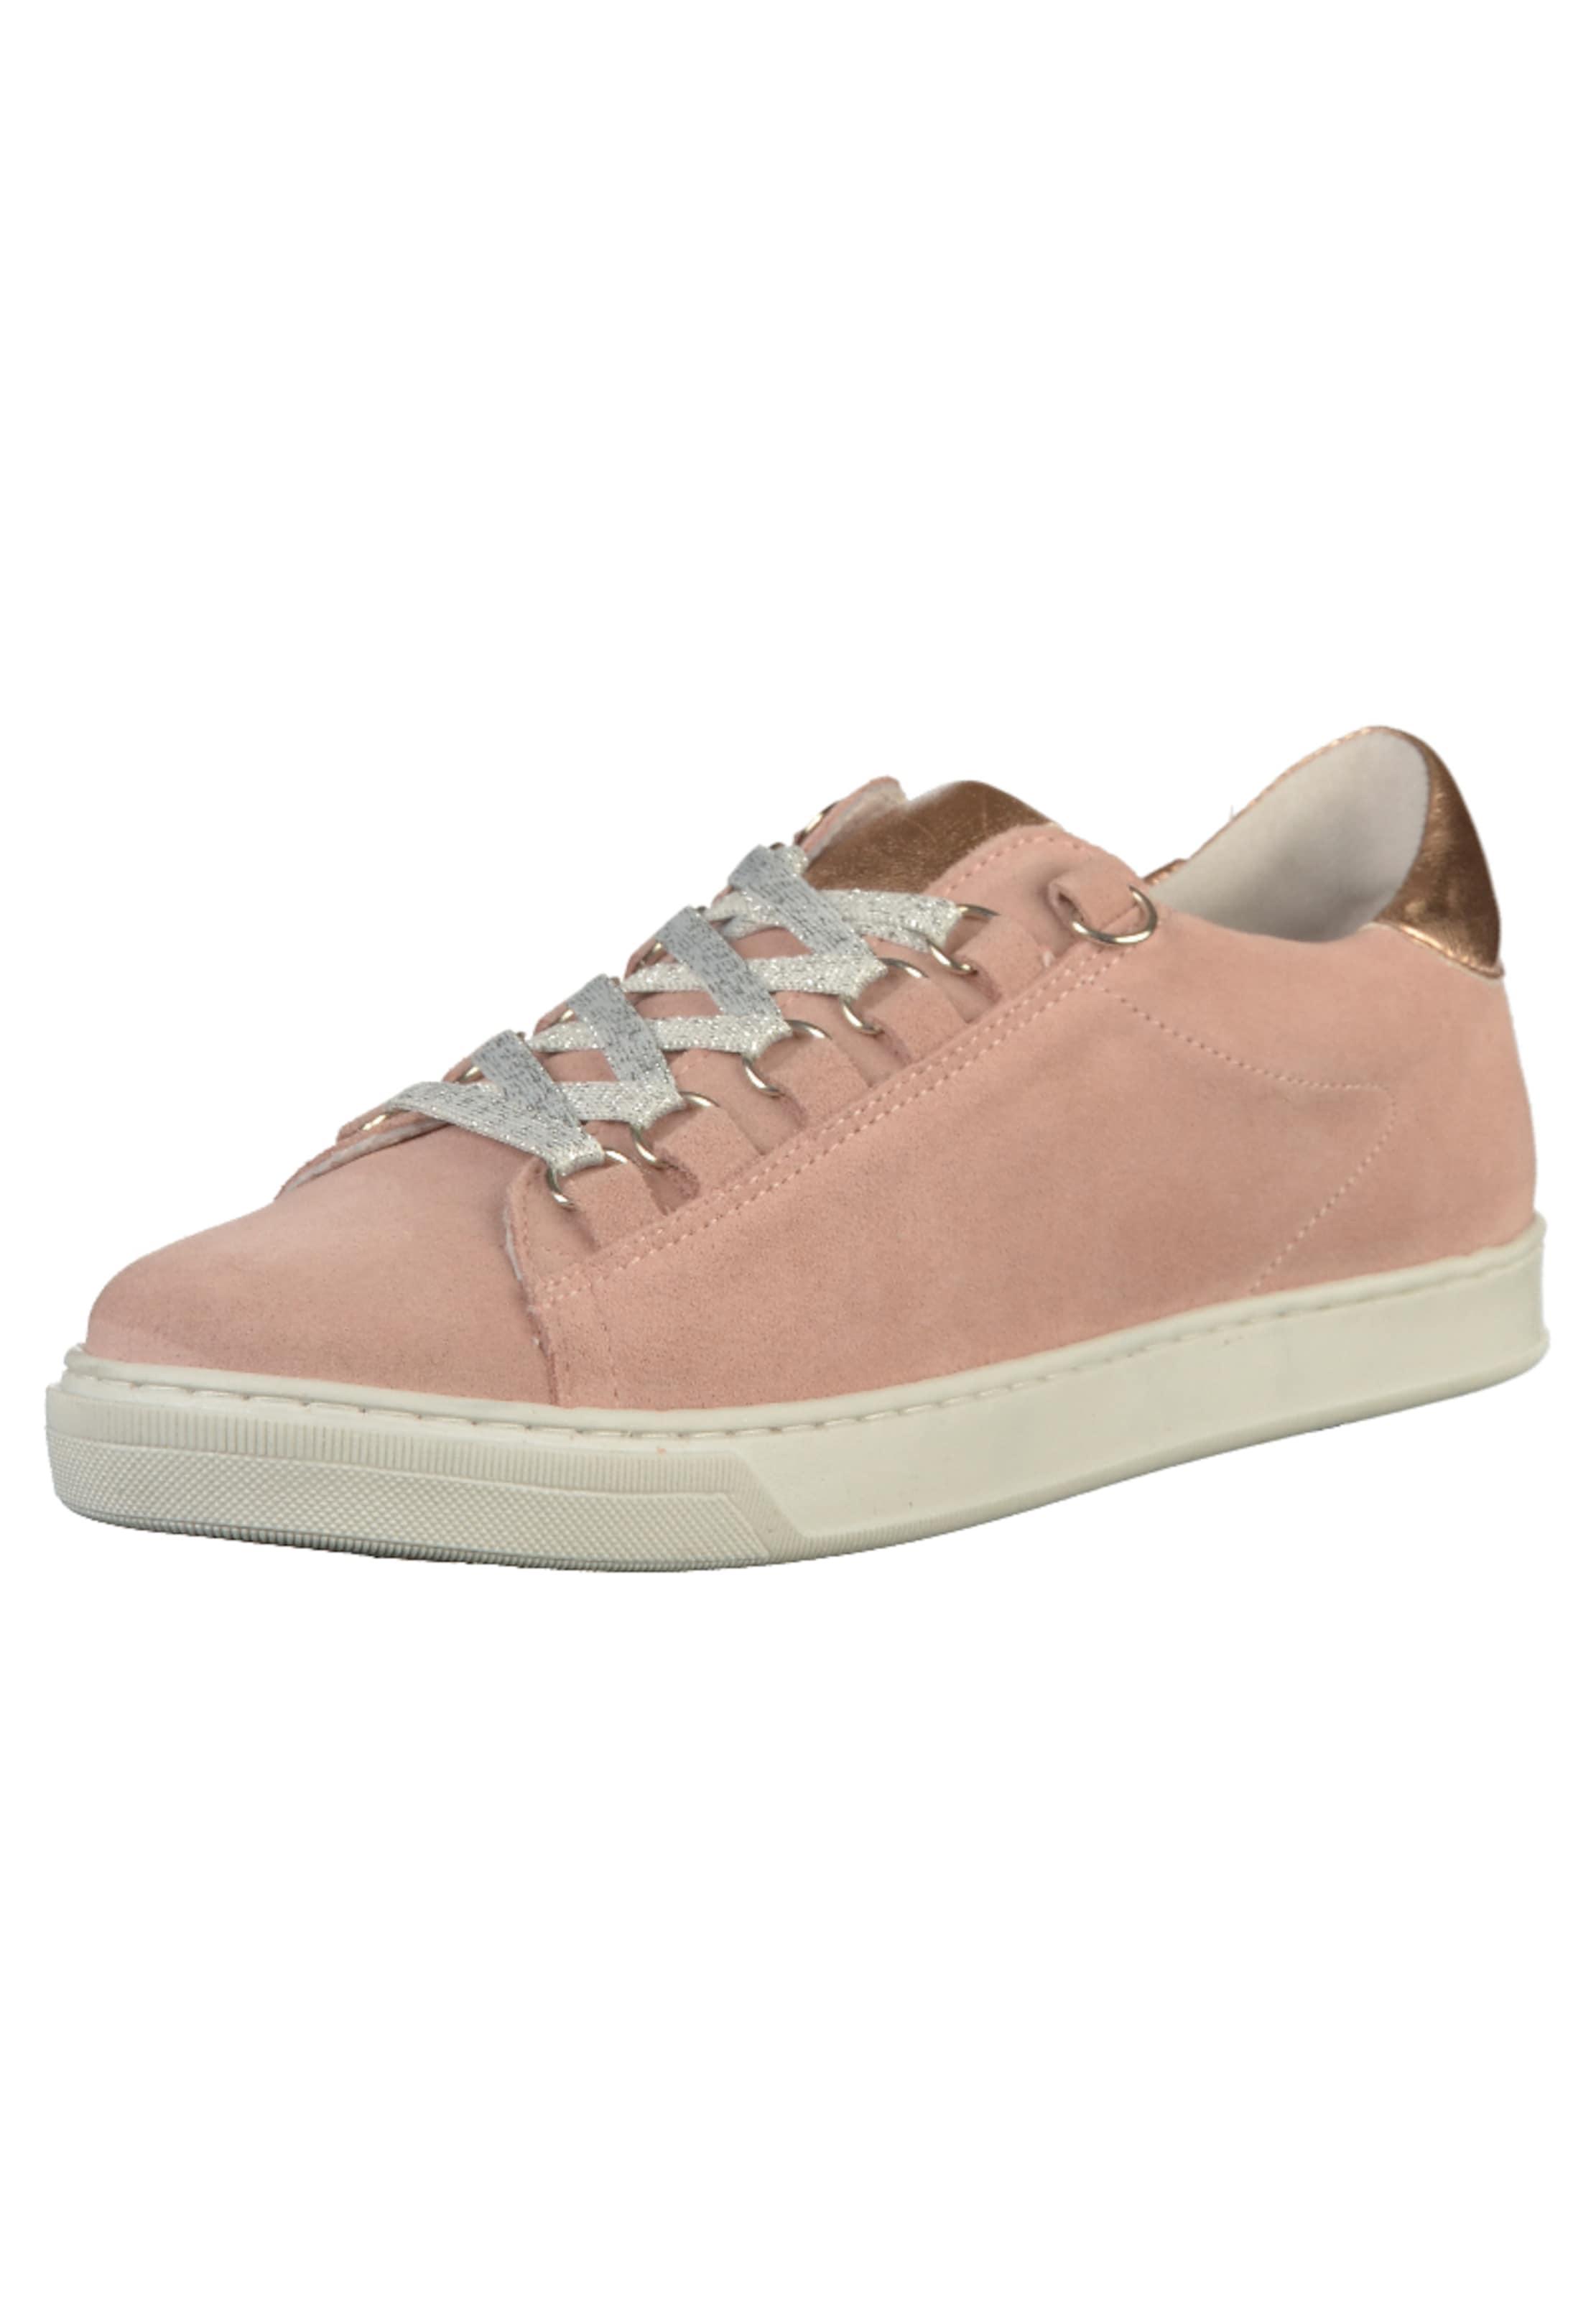 Sneaker Spm In Sneaker Sneaker In GoldRosa Spm In GoldRosa Spm GoldRosa mON0wv8n